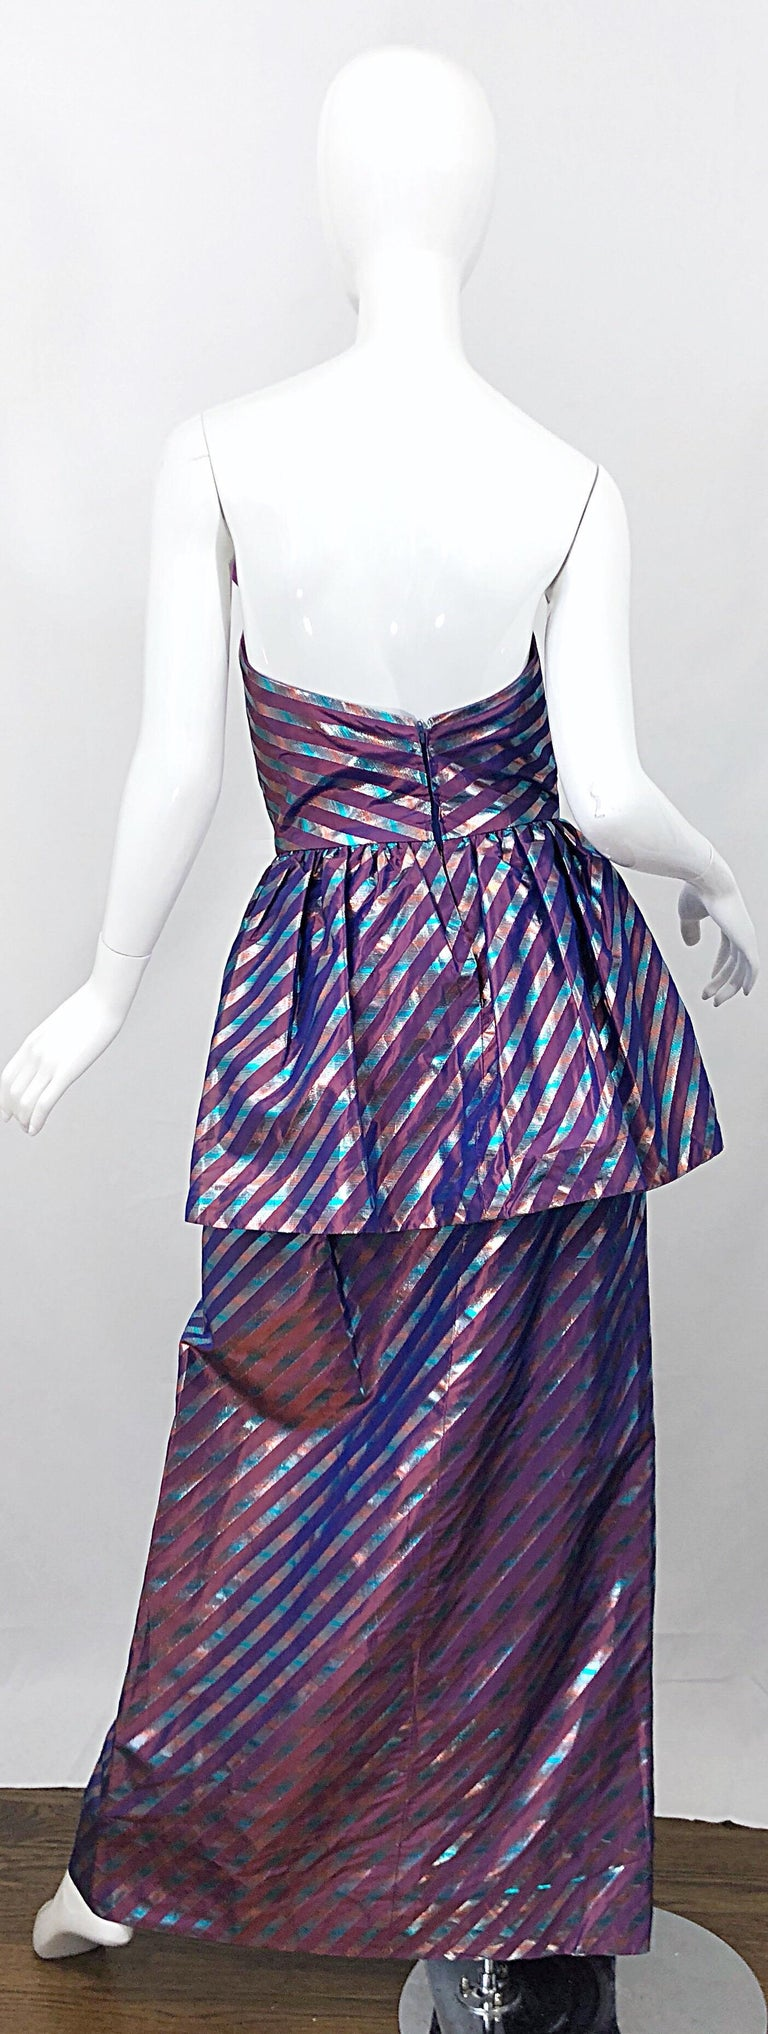 Avant Garde Ruben Parnis 1980s Sz 8 / 10 Vintage One Shoulder Prurple Silk Gown For Sale 1